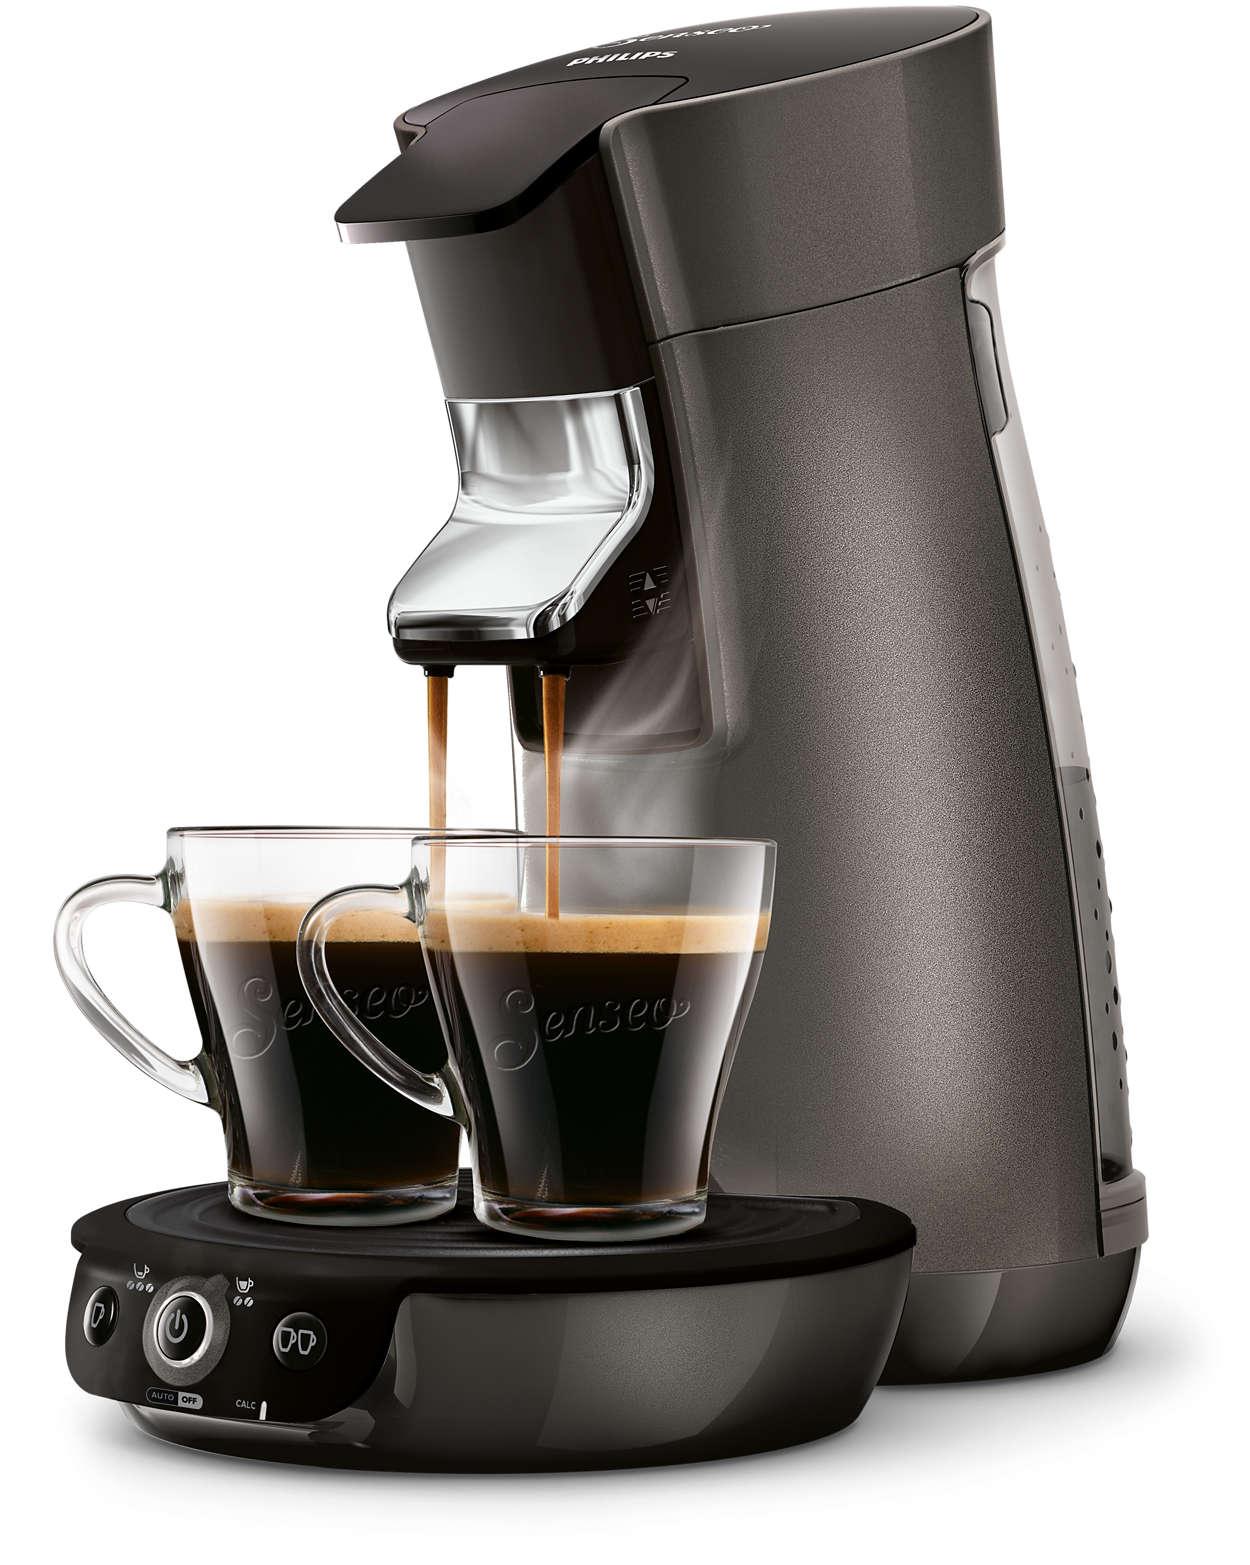 viva caf style machine caf dosettes hd7833 51 senseo. Black Bedroom Furniture Sets. Home Design Ideas